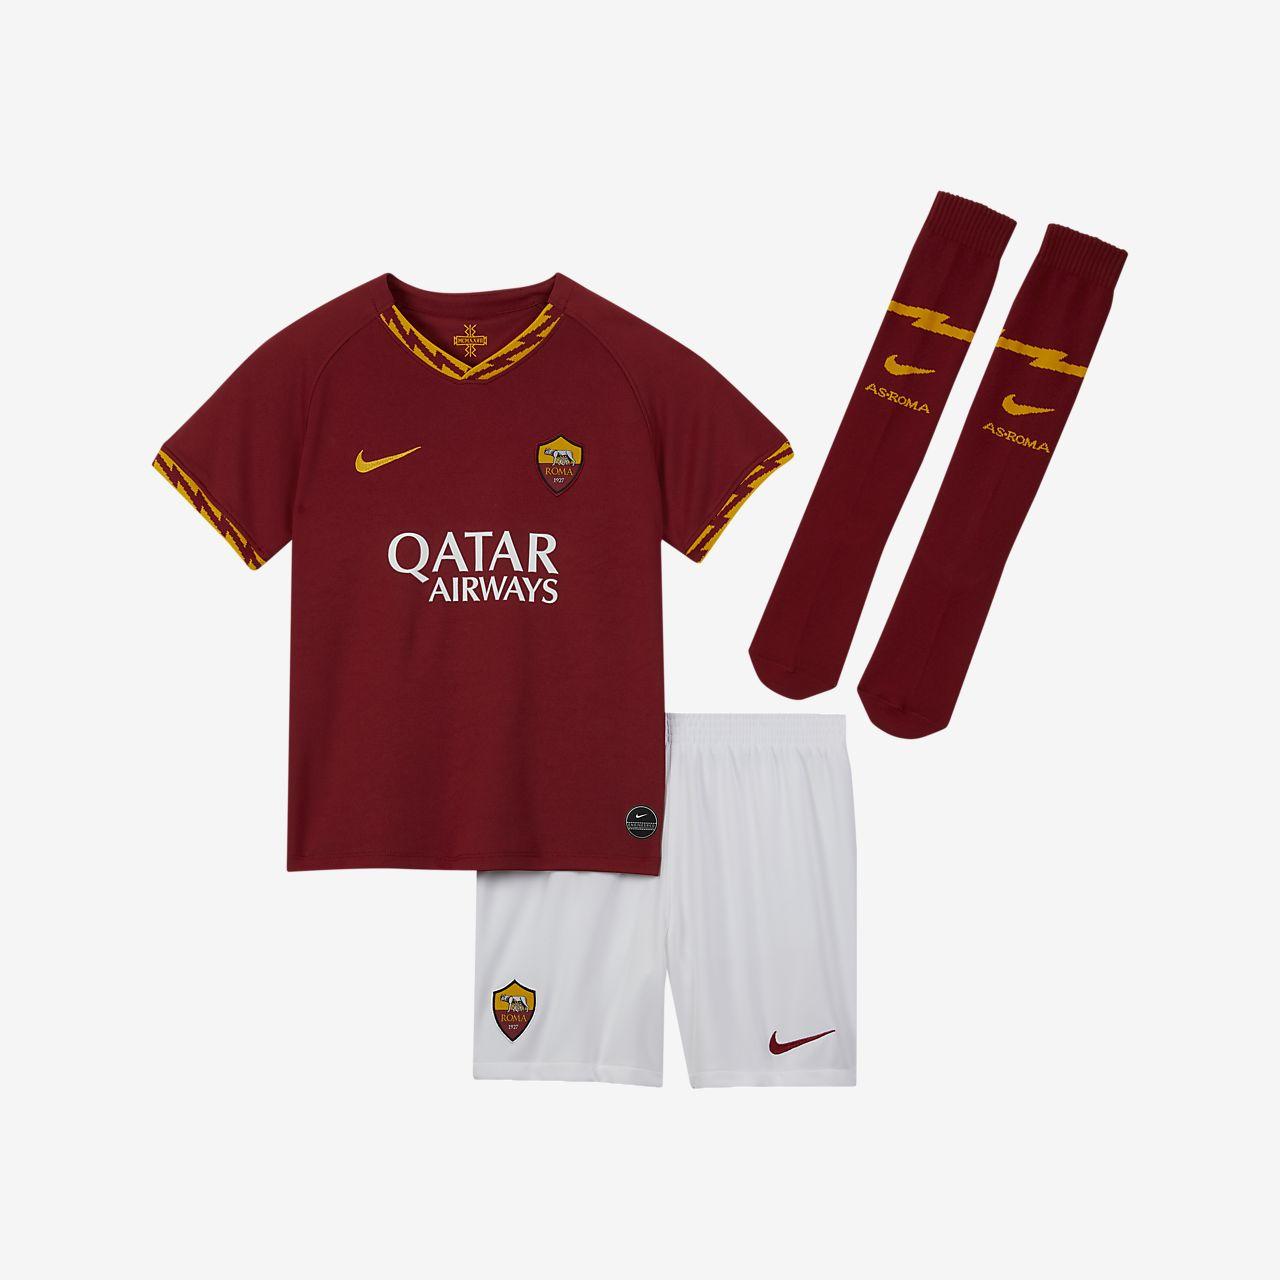 A.S. Roma 2019/20 Home Küçük Çocuk Futbol Forması